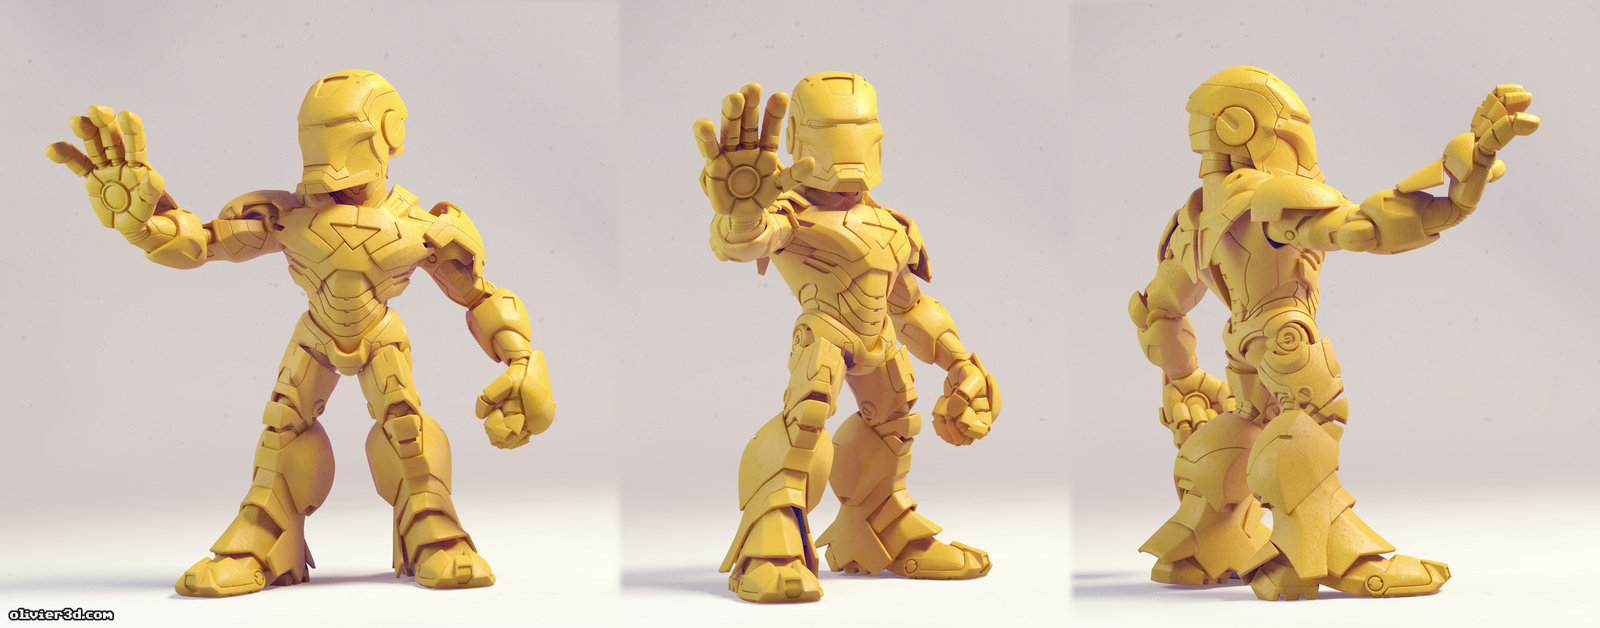 Ironman MK-VI